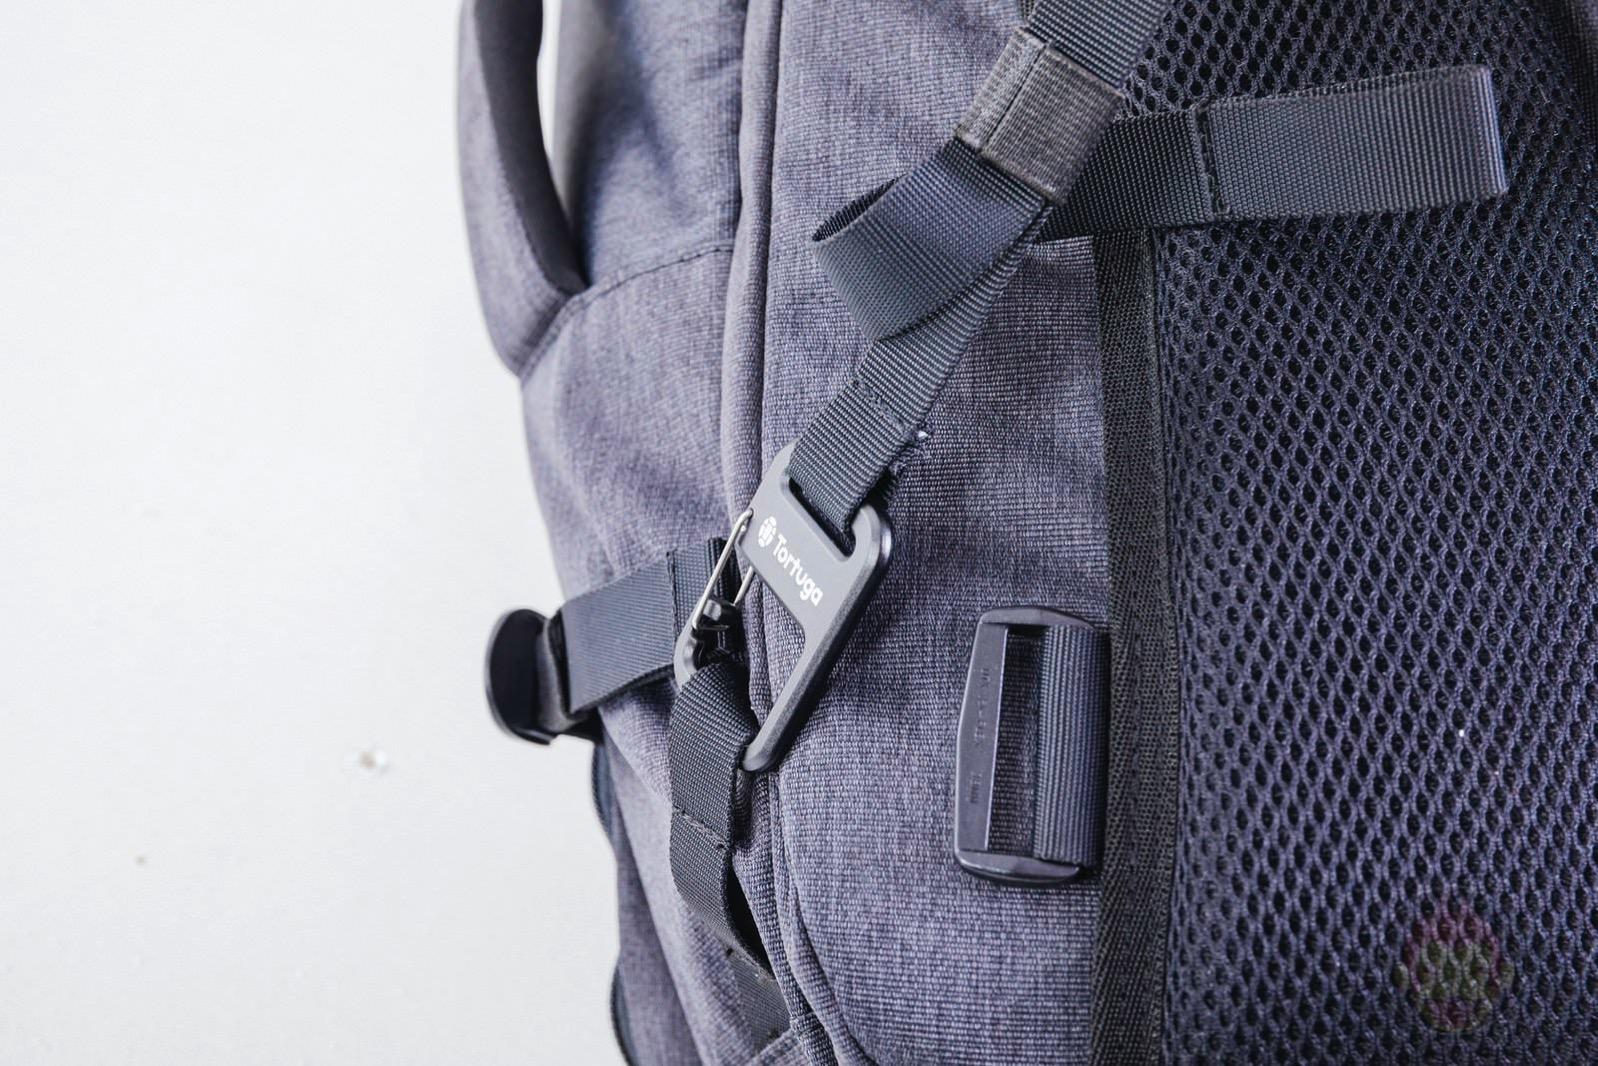 Tortuga-Setout-Backpack-35liter-review-38.jpg